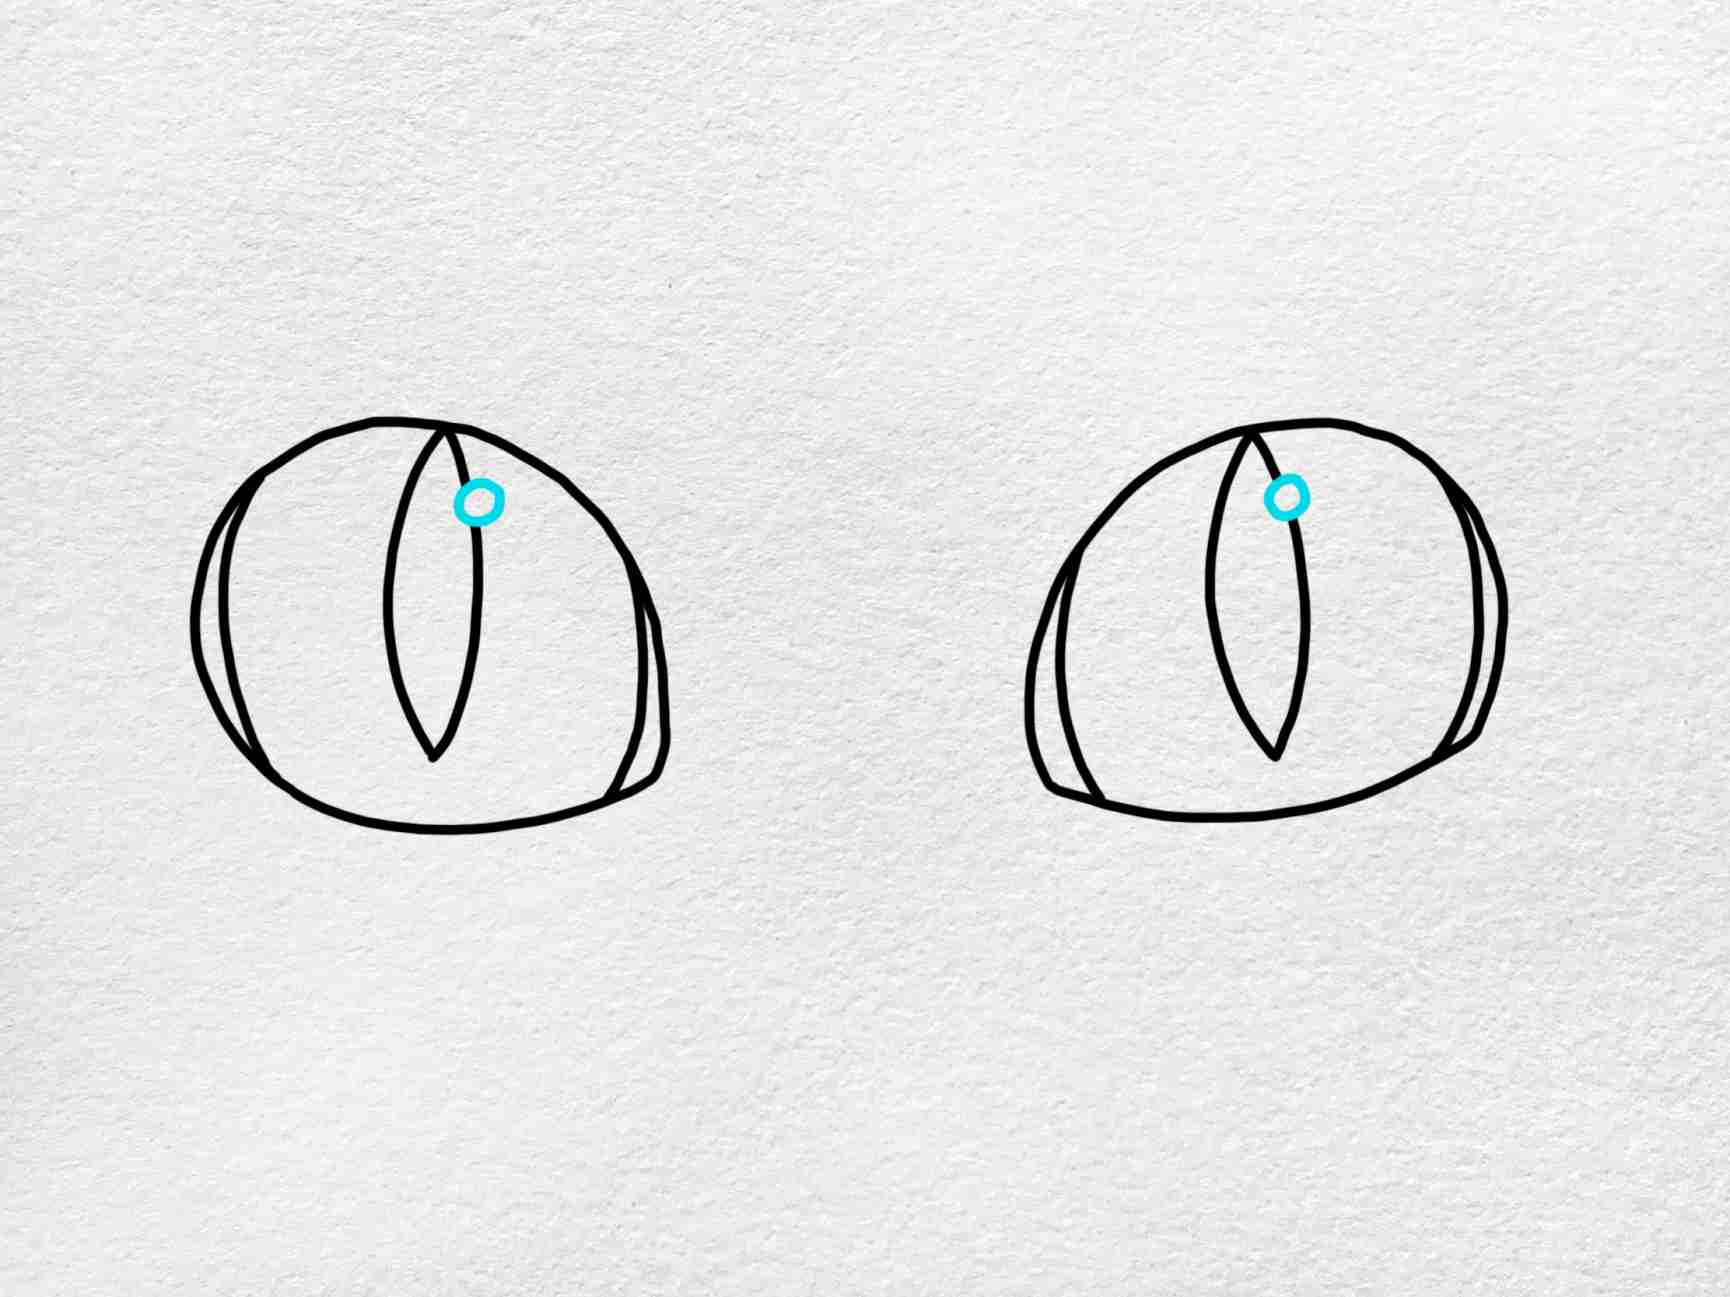 Cat Eyes Drawing: Step 5